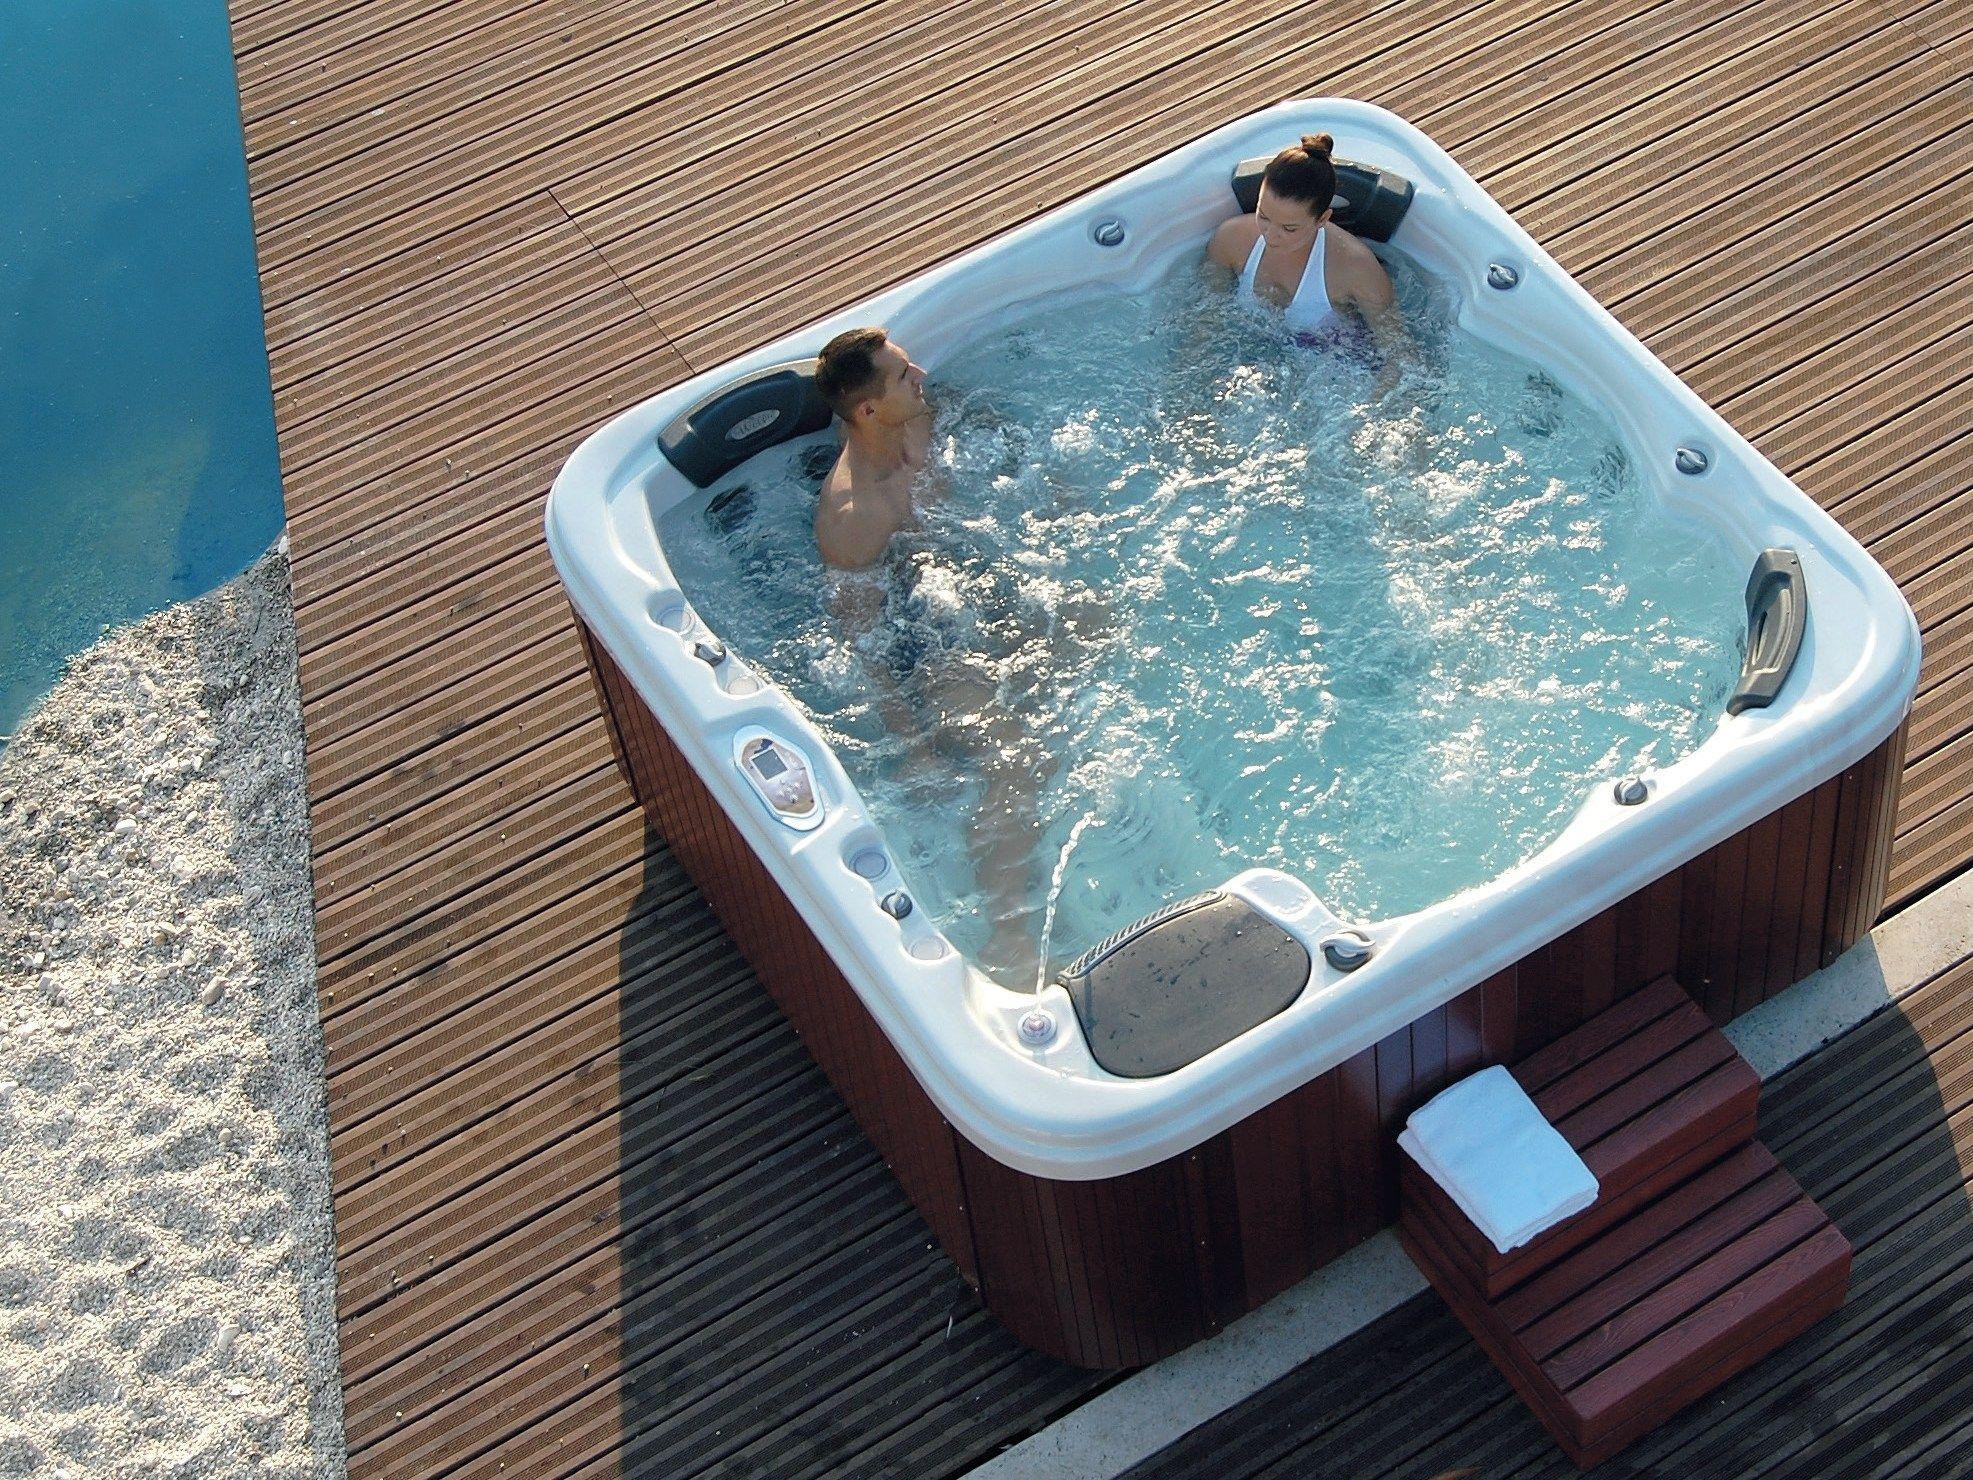 square hydromassage hot tub 6 seats dream by gruppo geromin. Black Bedroom Furniture Sets. Home Design Ideas